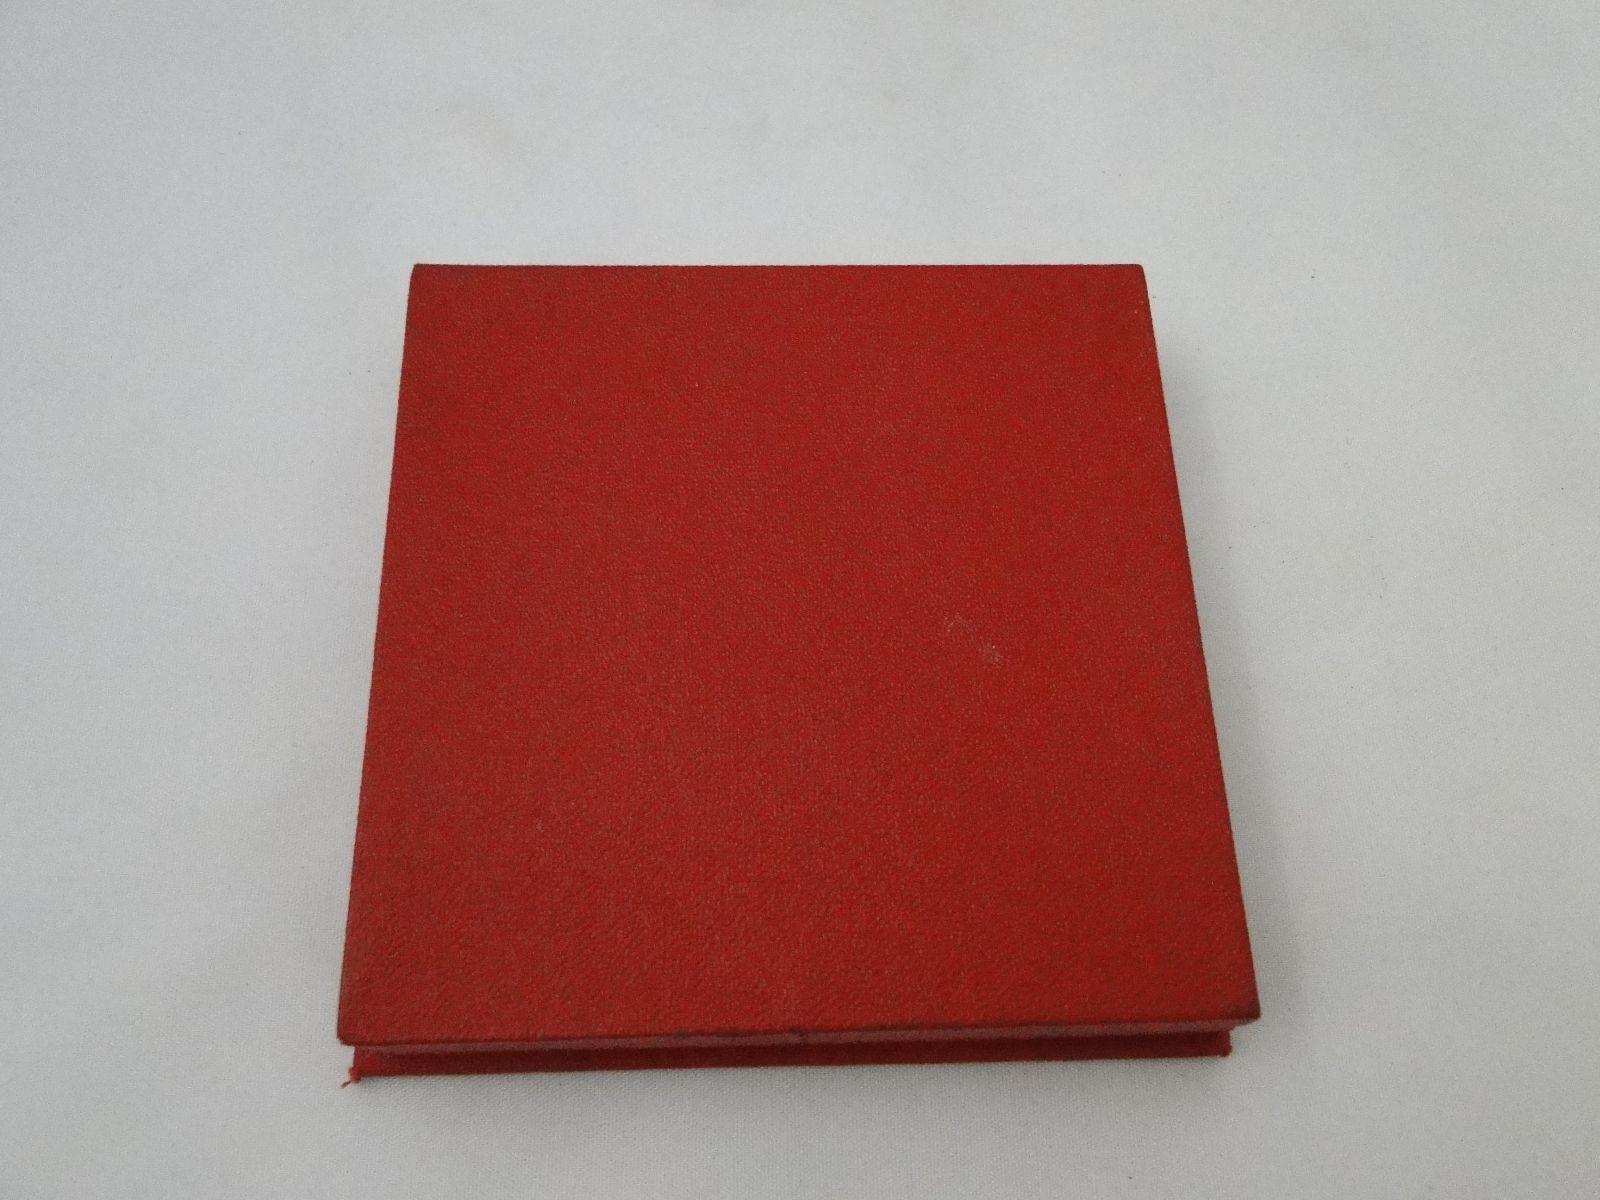 DSC08093.JPG (1600×1200)